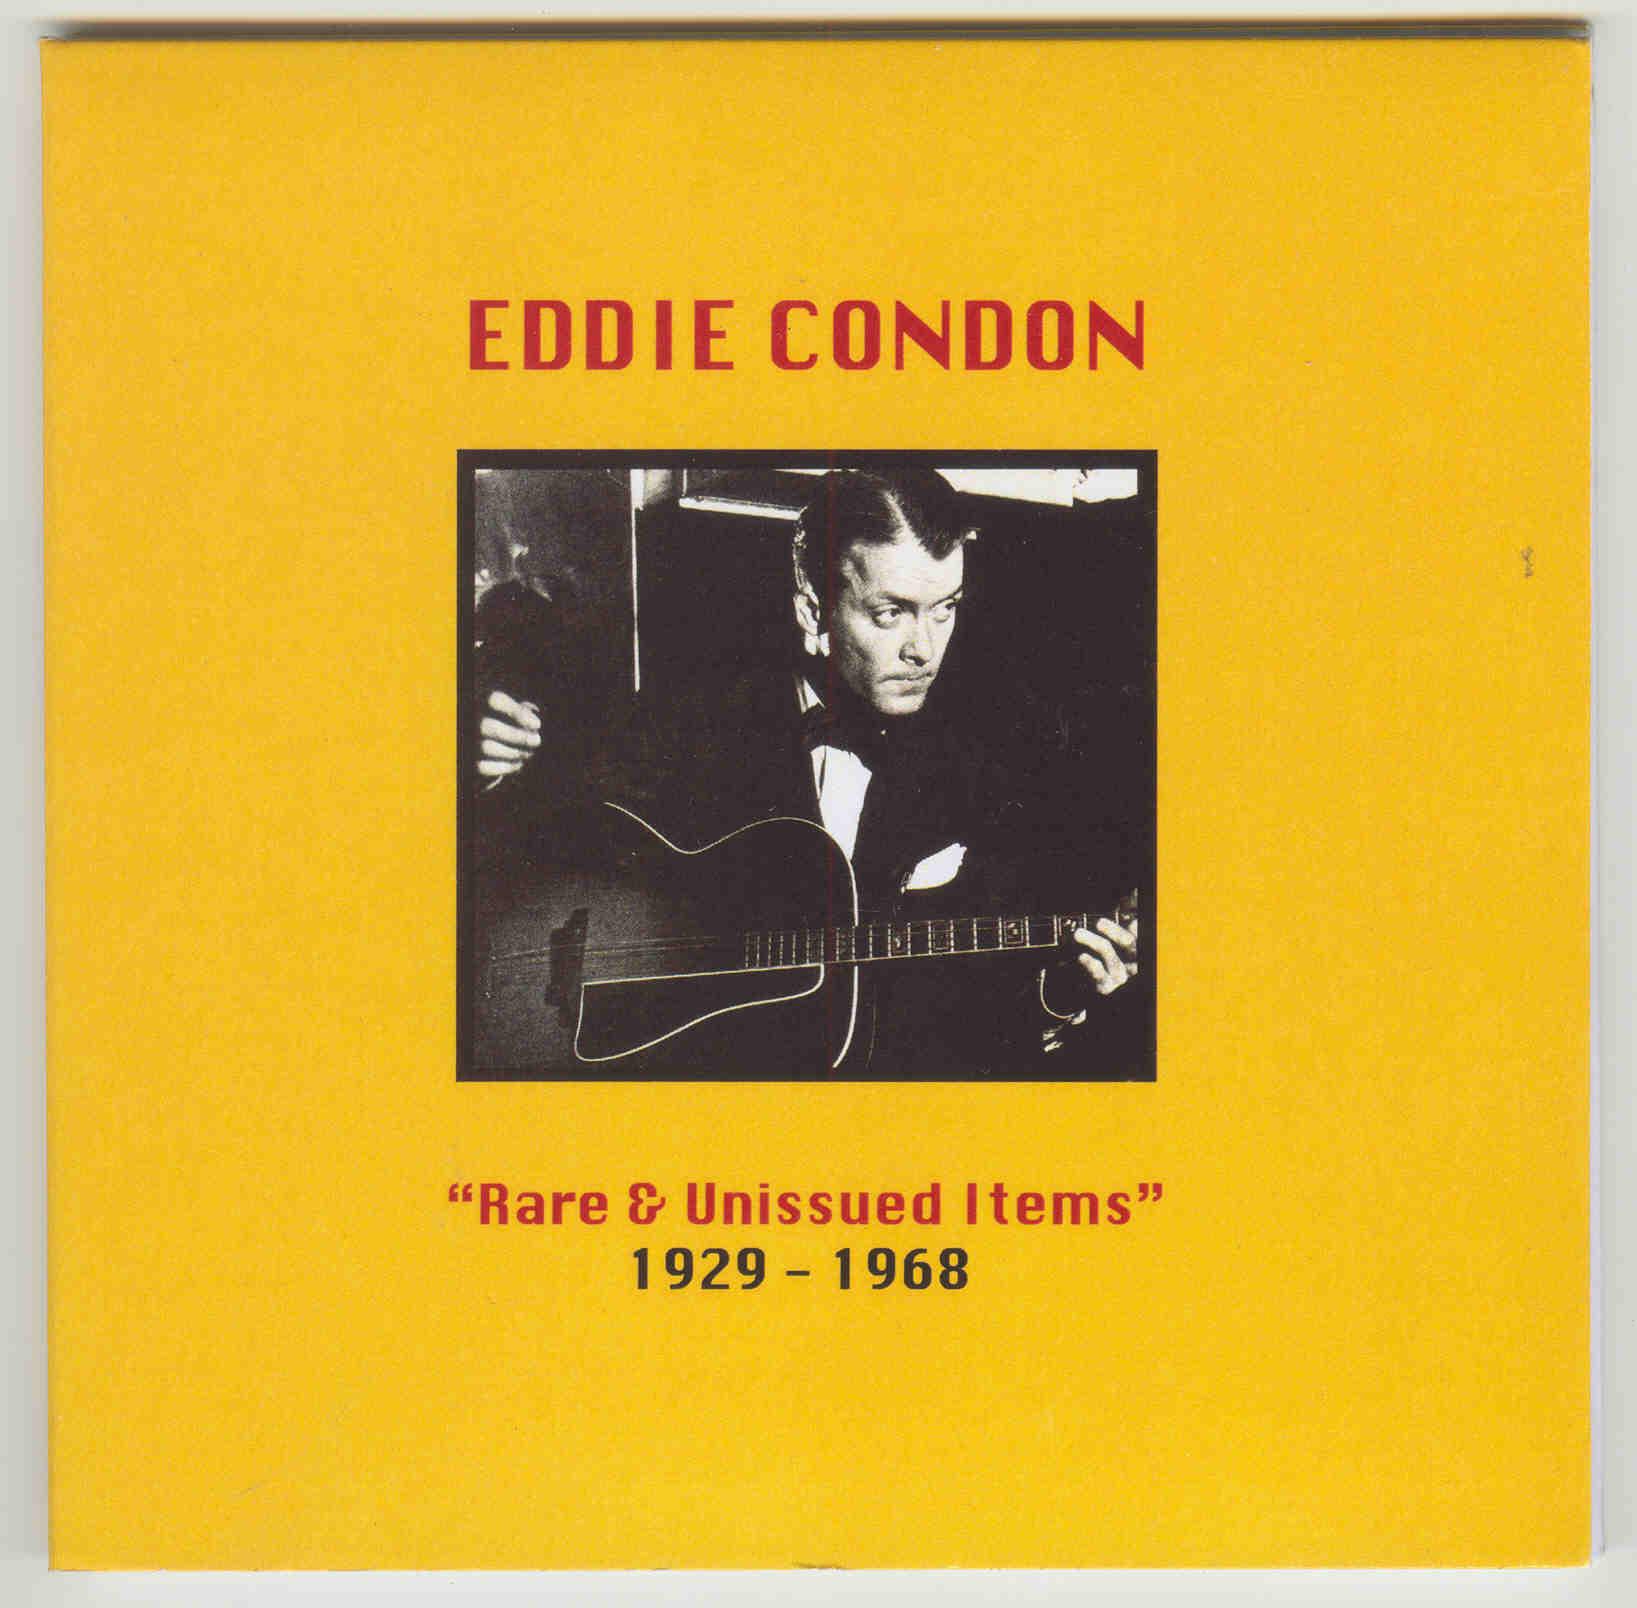 Eddie Condon's quote